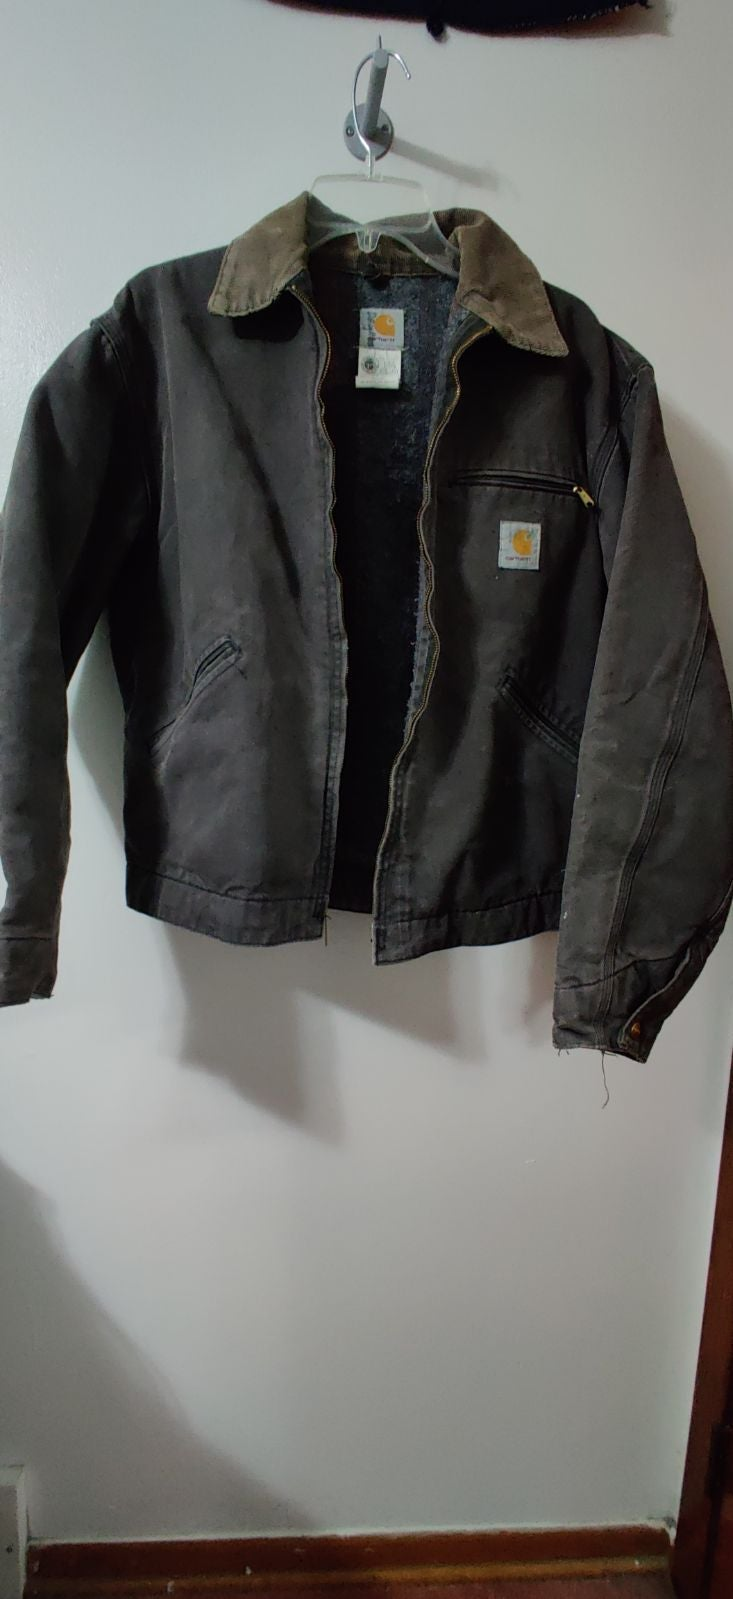 Carhartt Vintage Distressed Blanket lined Trucker Jacket size 44